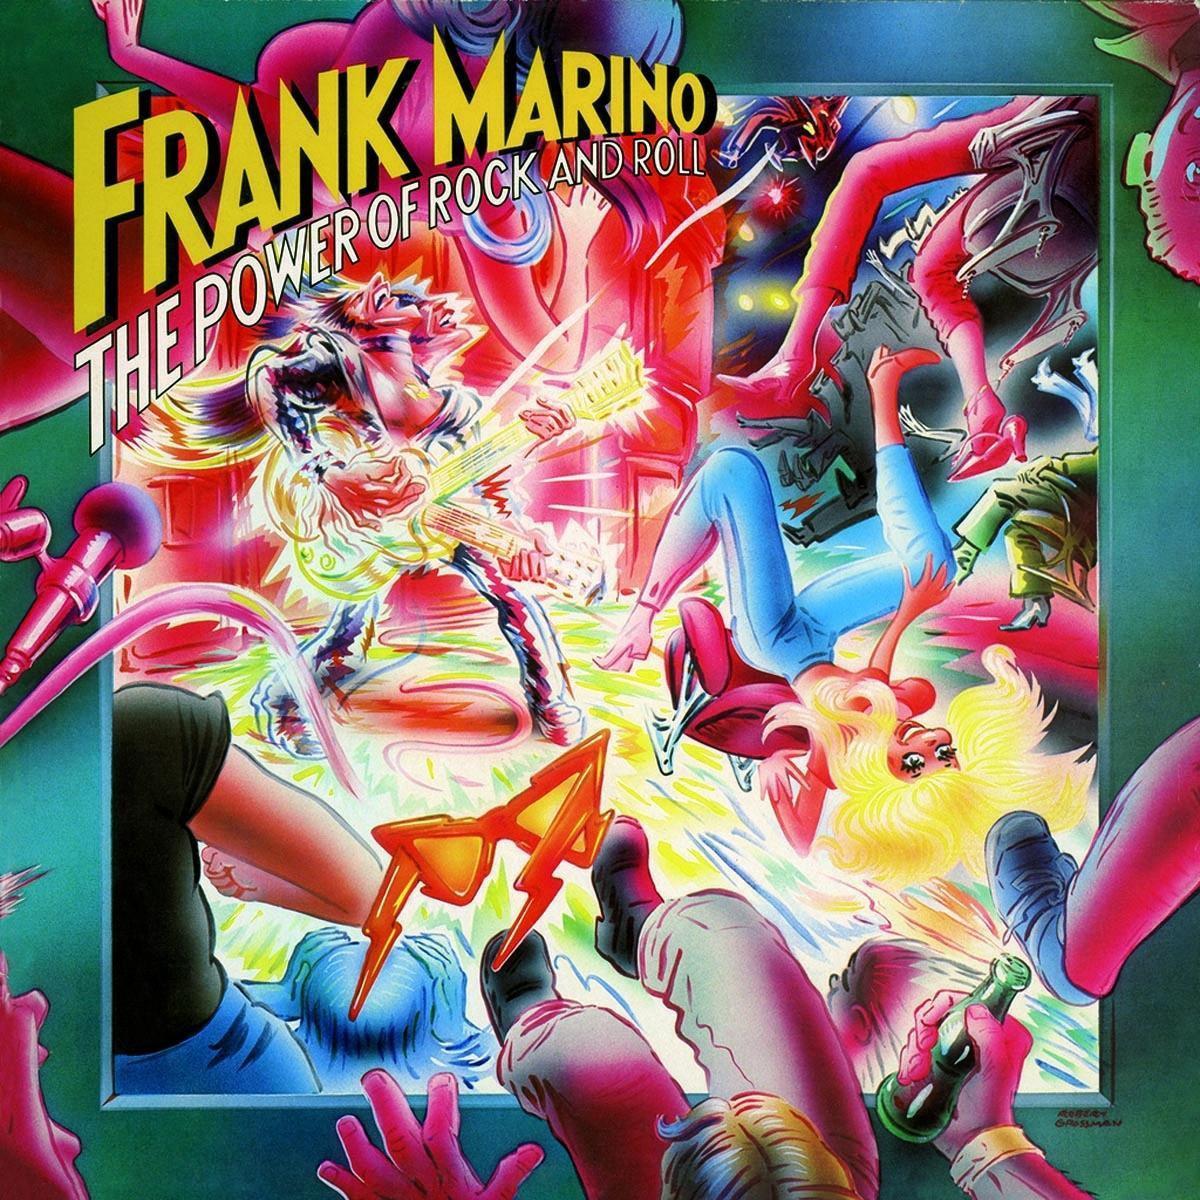 bol.com   Power Of Rock'N'Roll, Frank Marino   CD (album)   Muziek